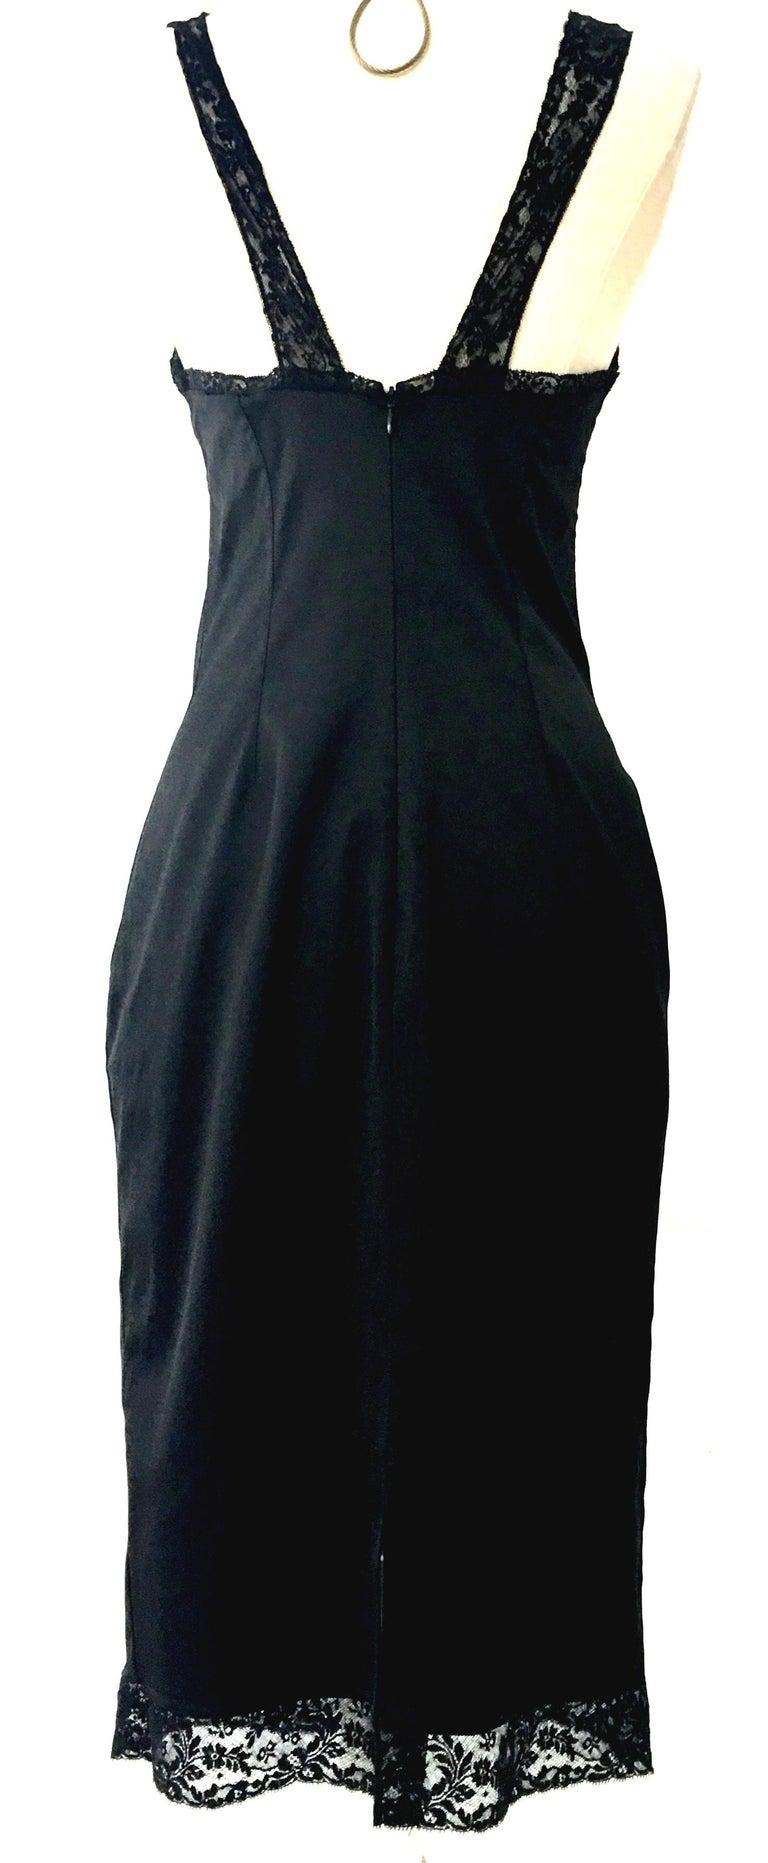 81611d453b 90'S Classic Dolce & Gabbana Black Fitted Slip Dress Sz-40 For Sale 1